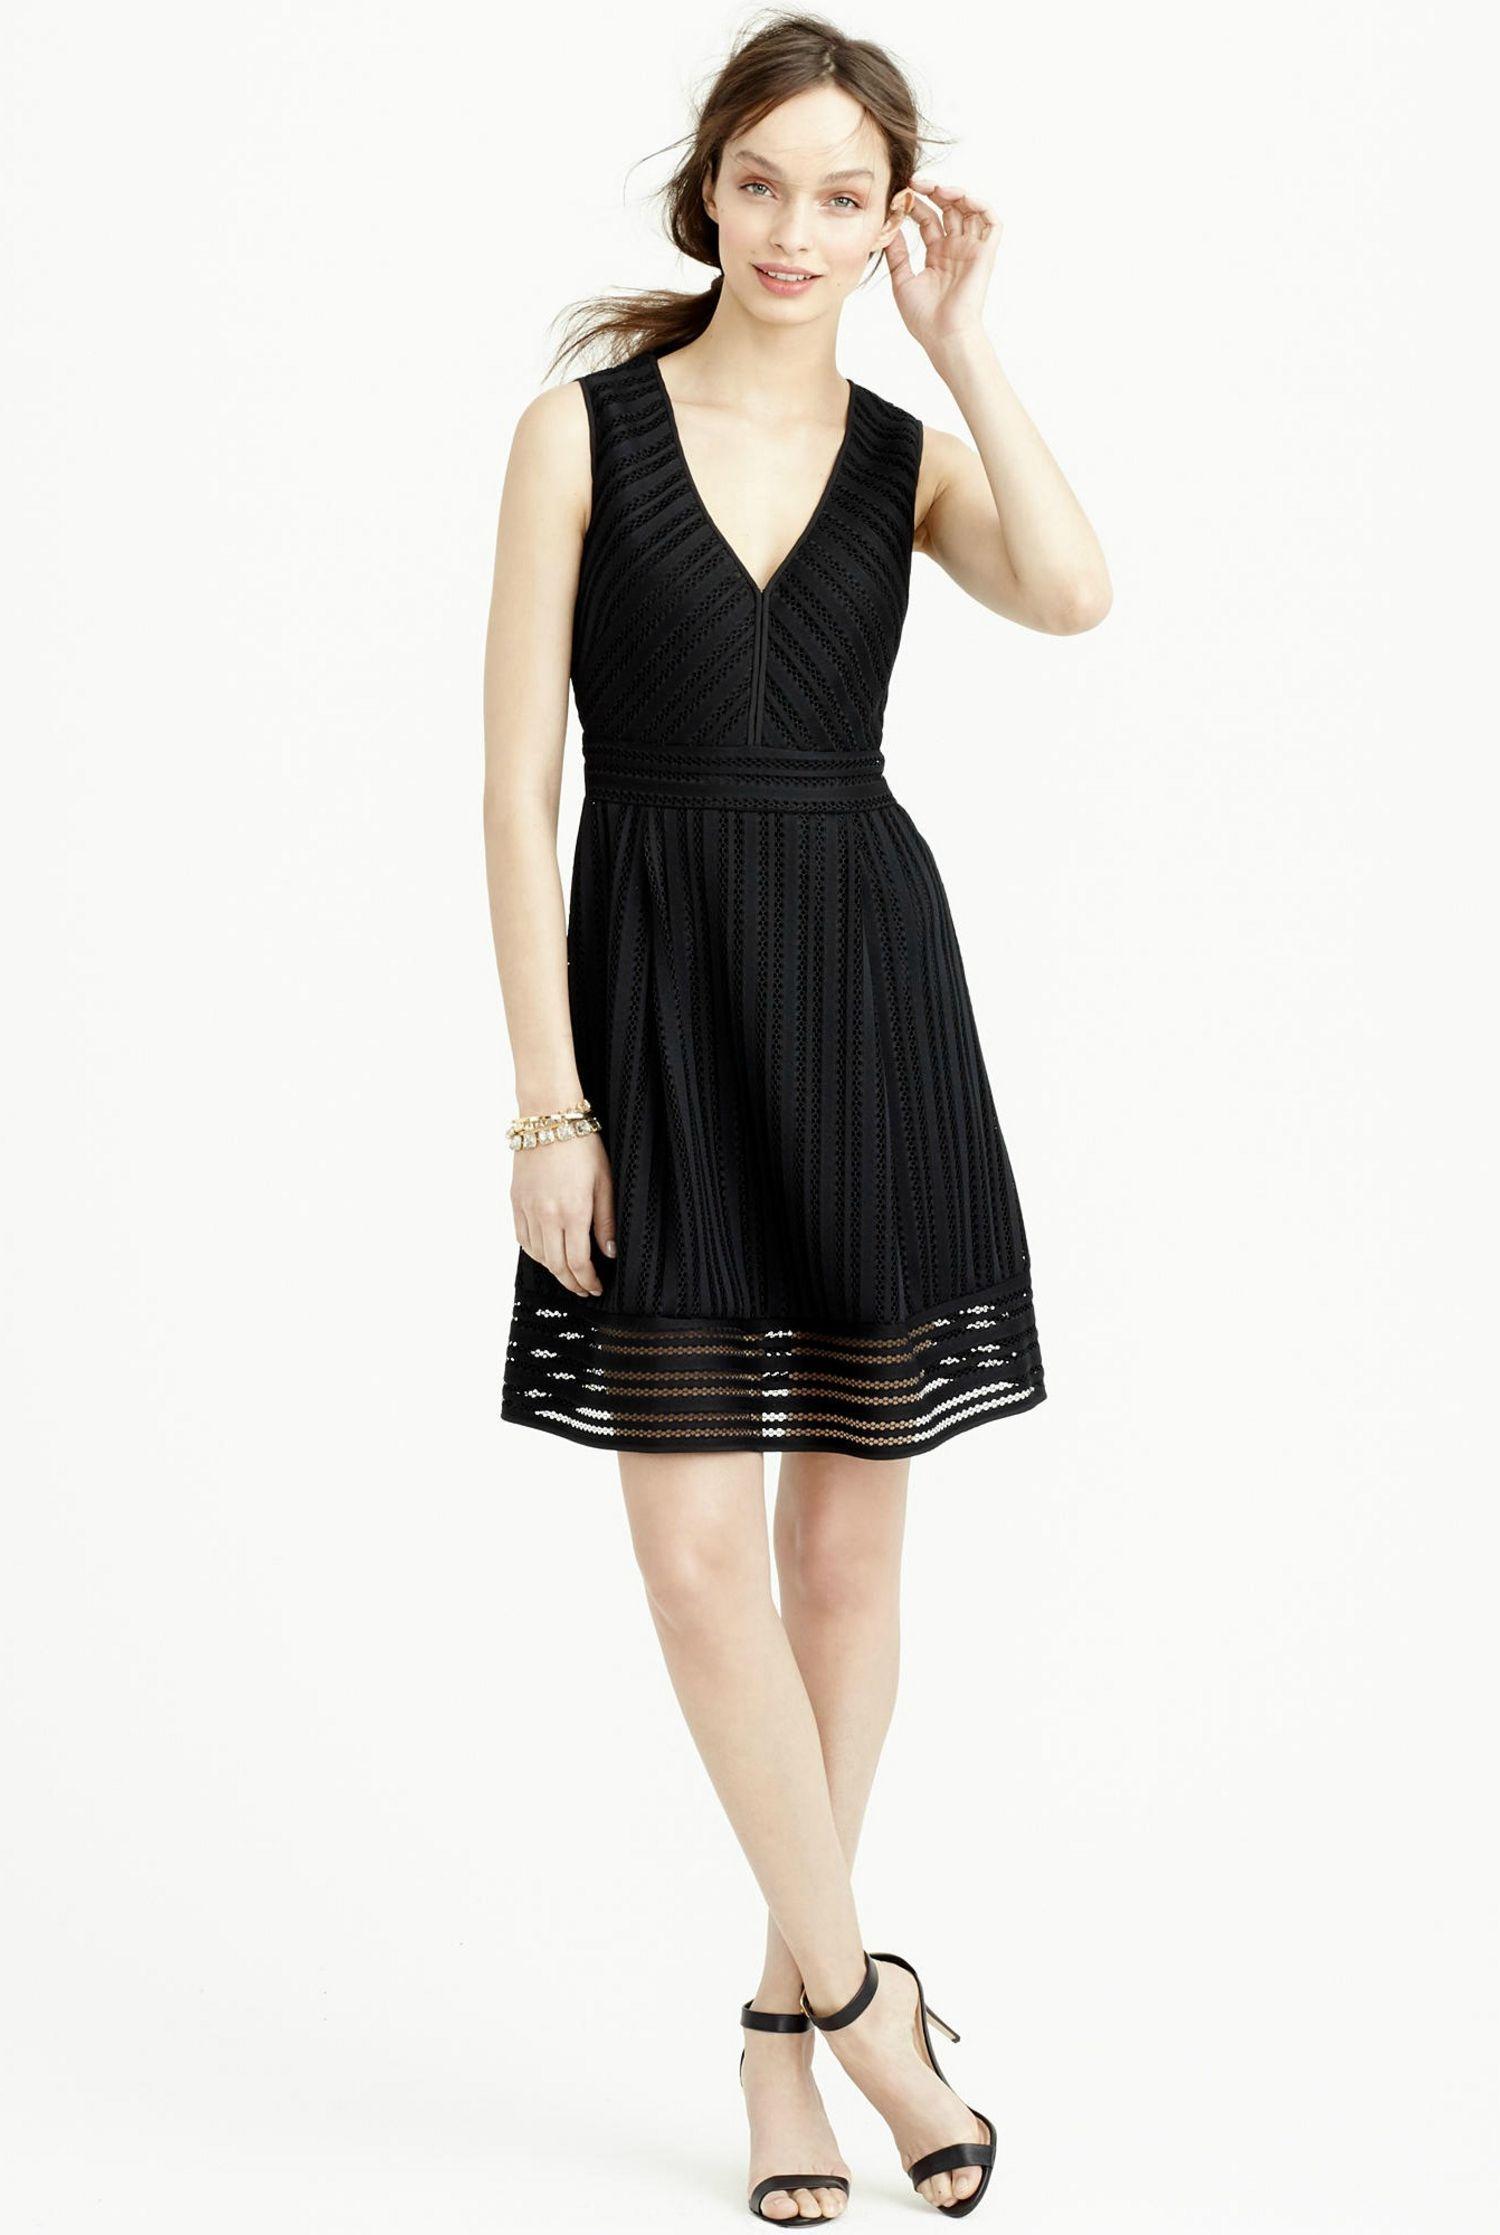 Simple Black Dress For Wedding